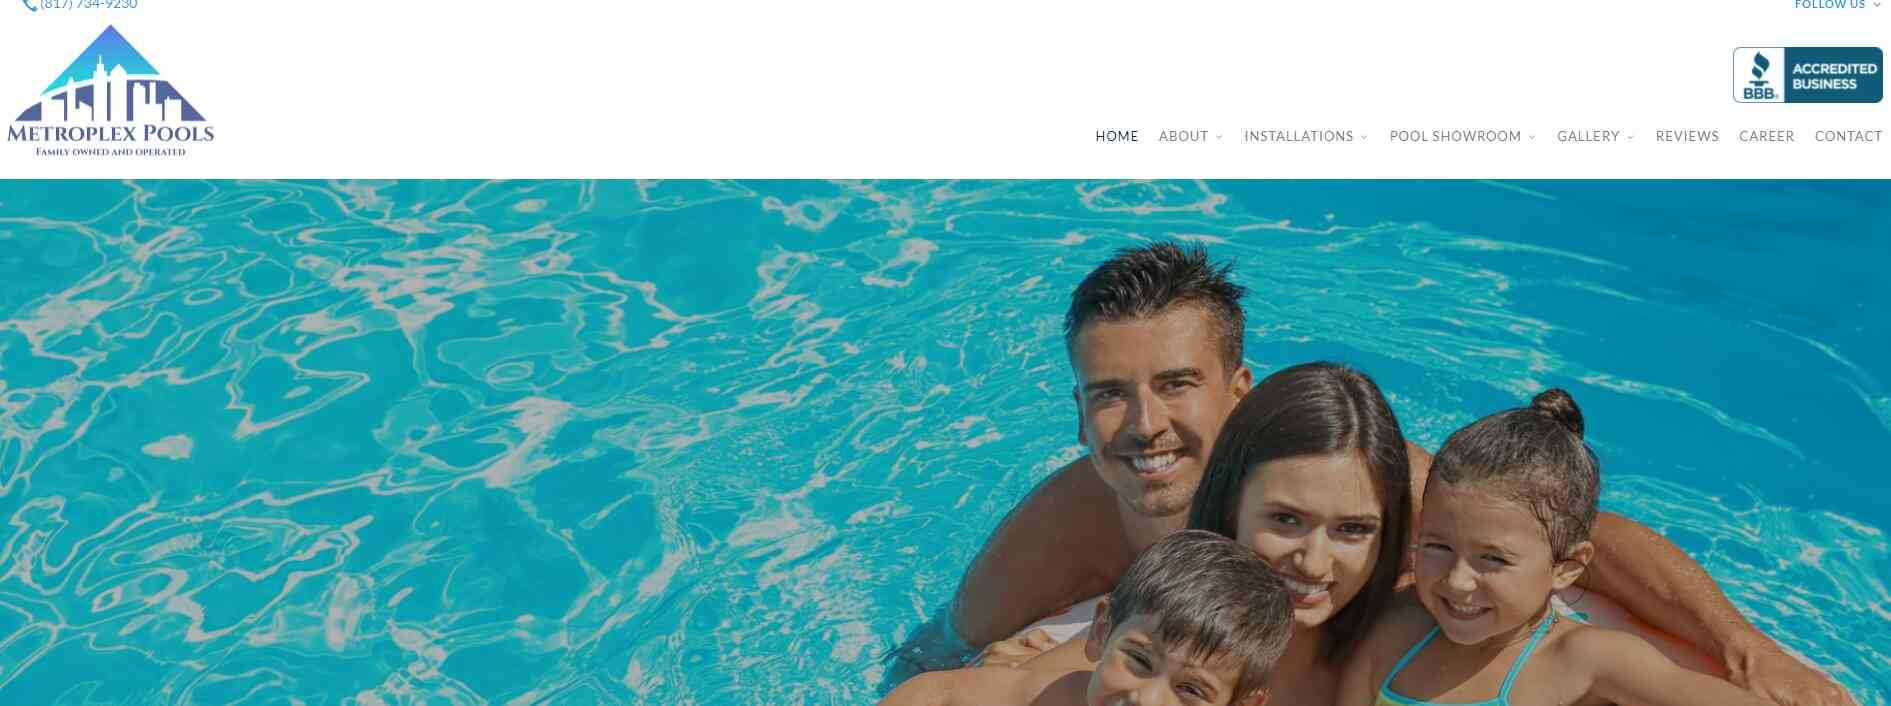 Metroplex Pools reviews and complaints